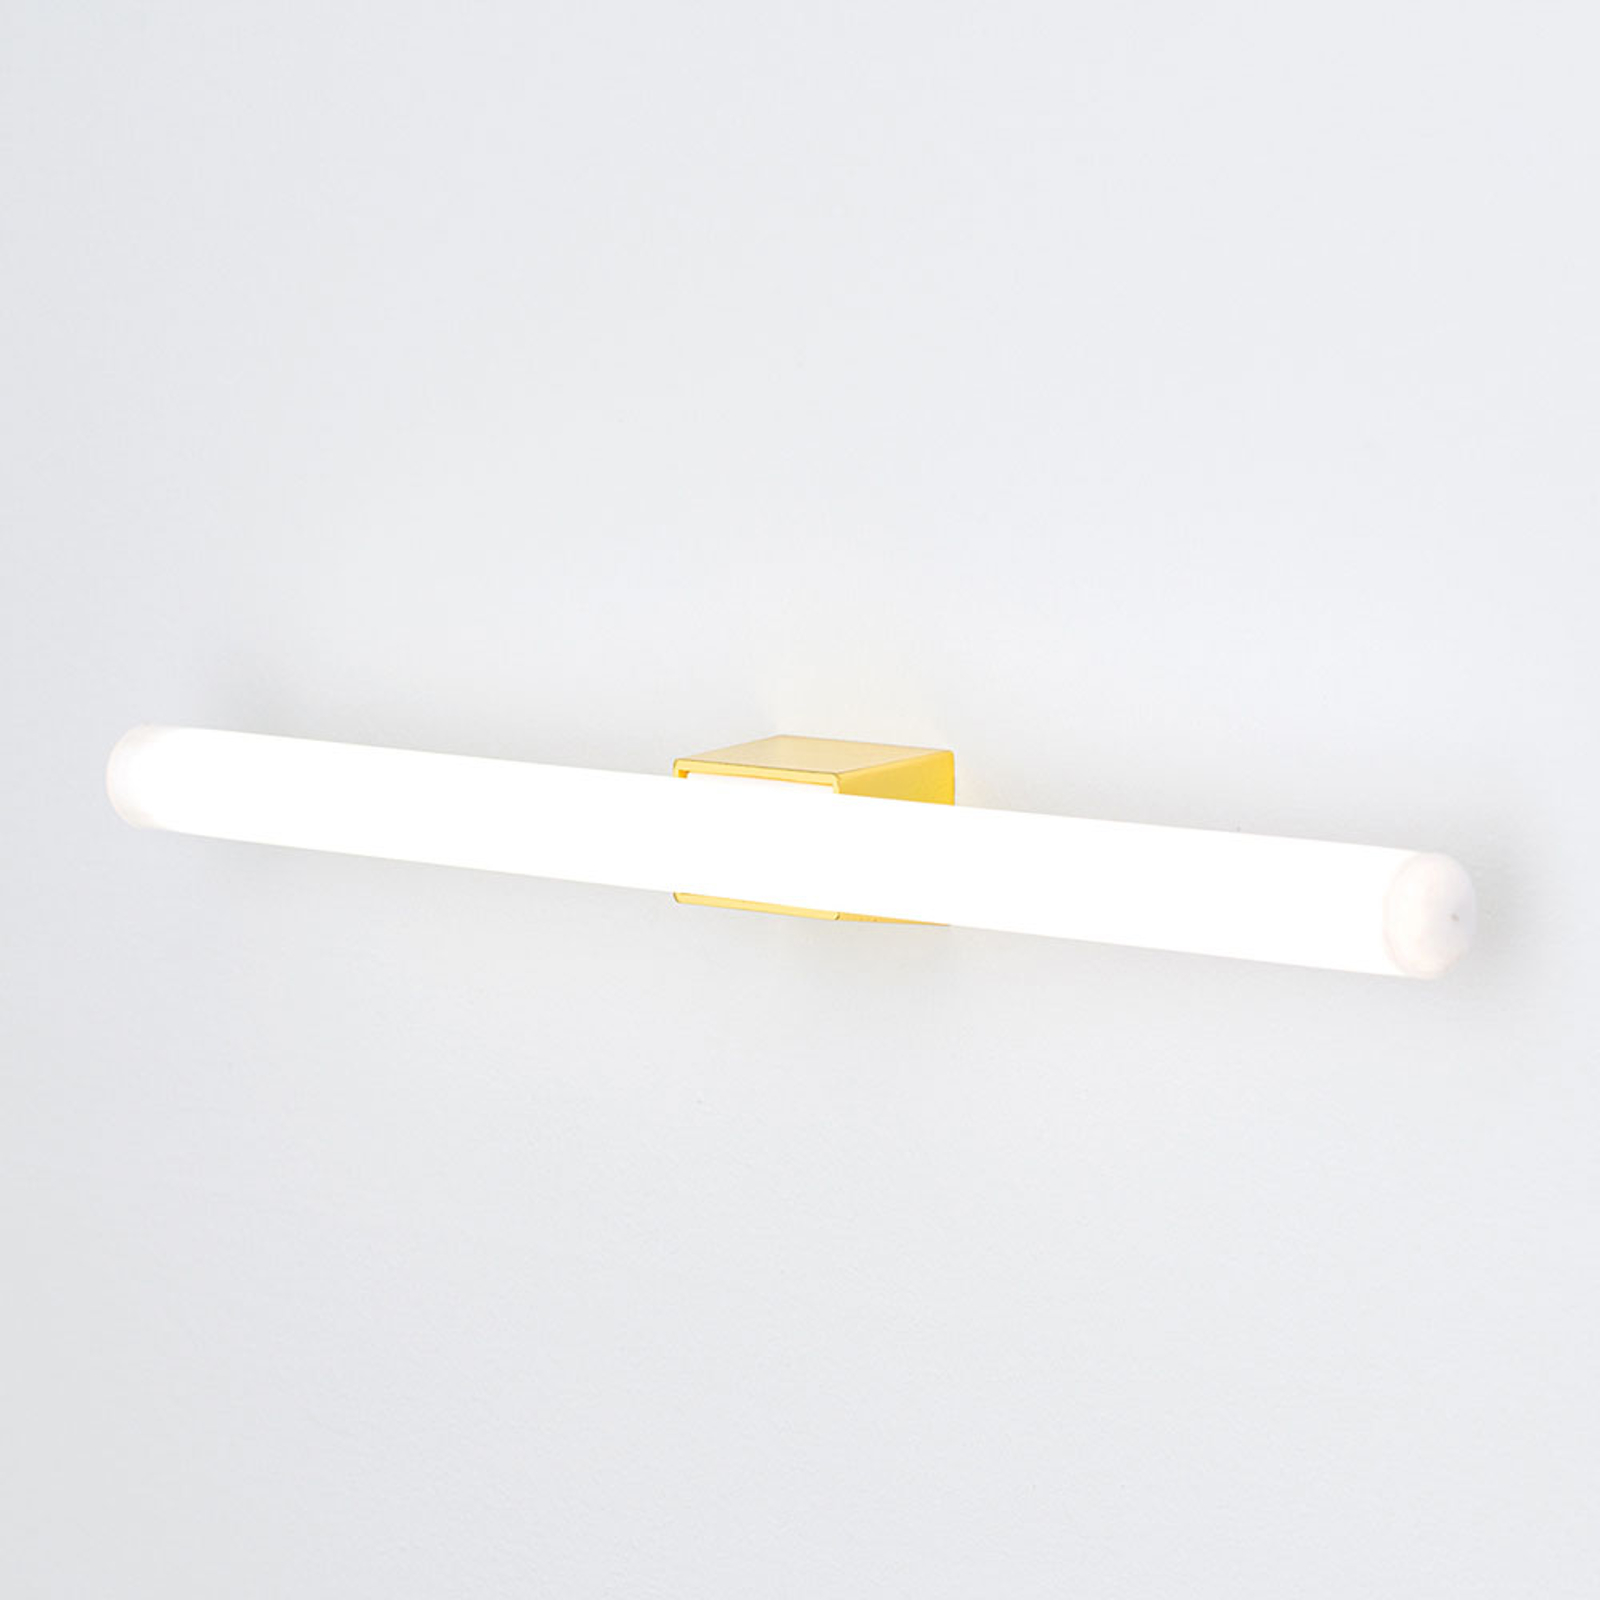 LED-speillampe Visagist, messing feste